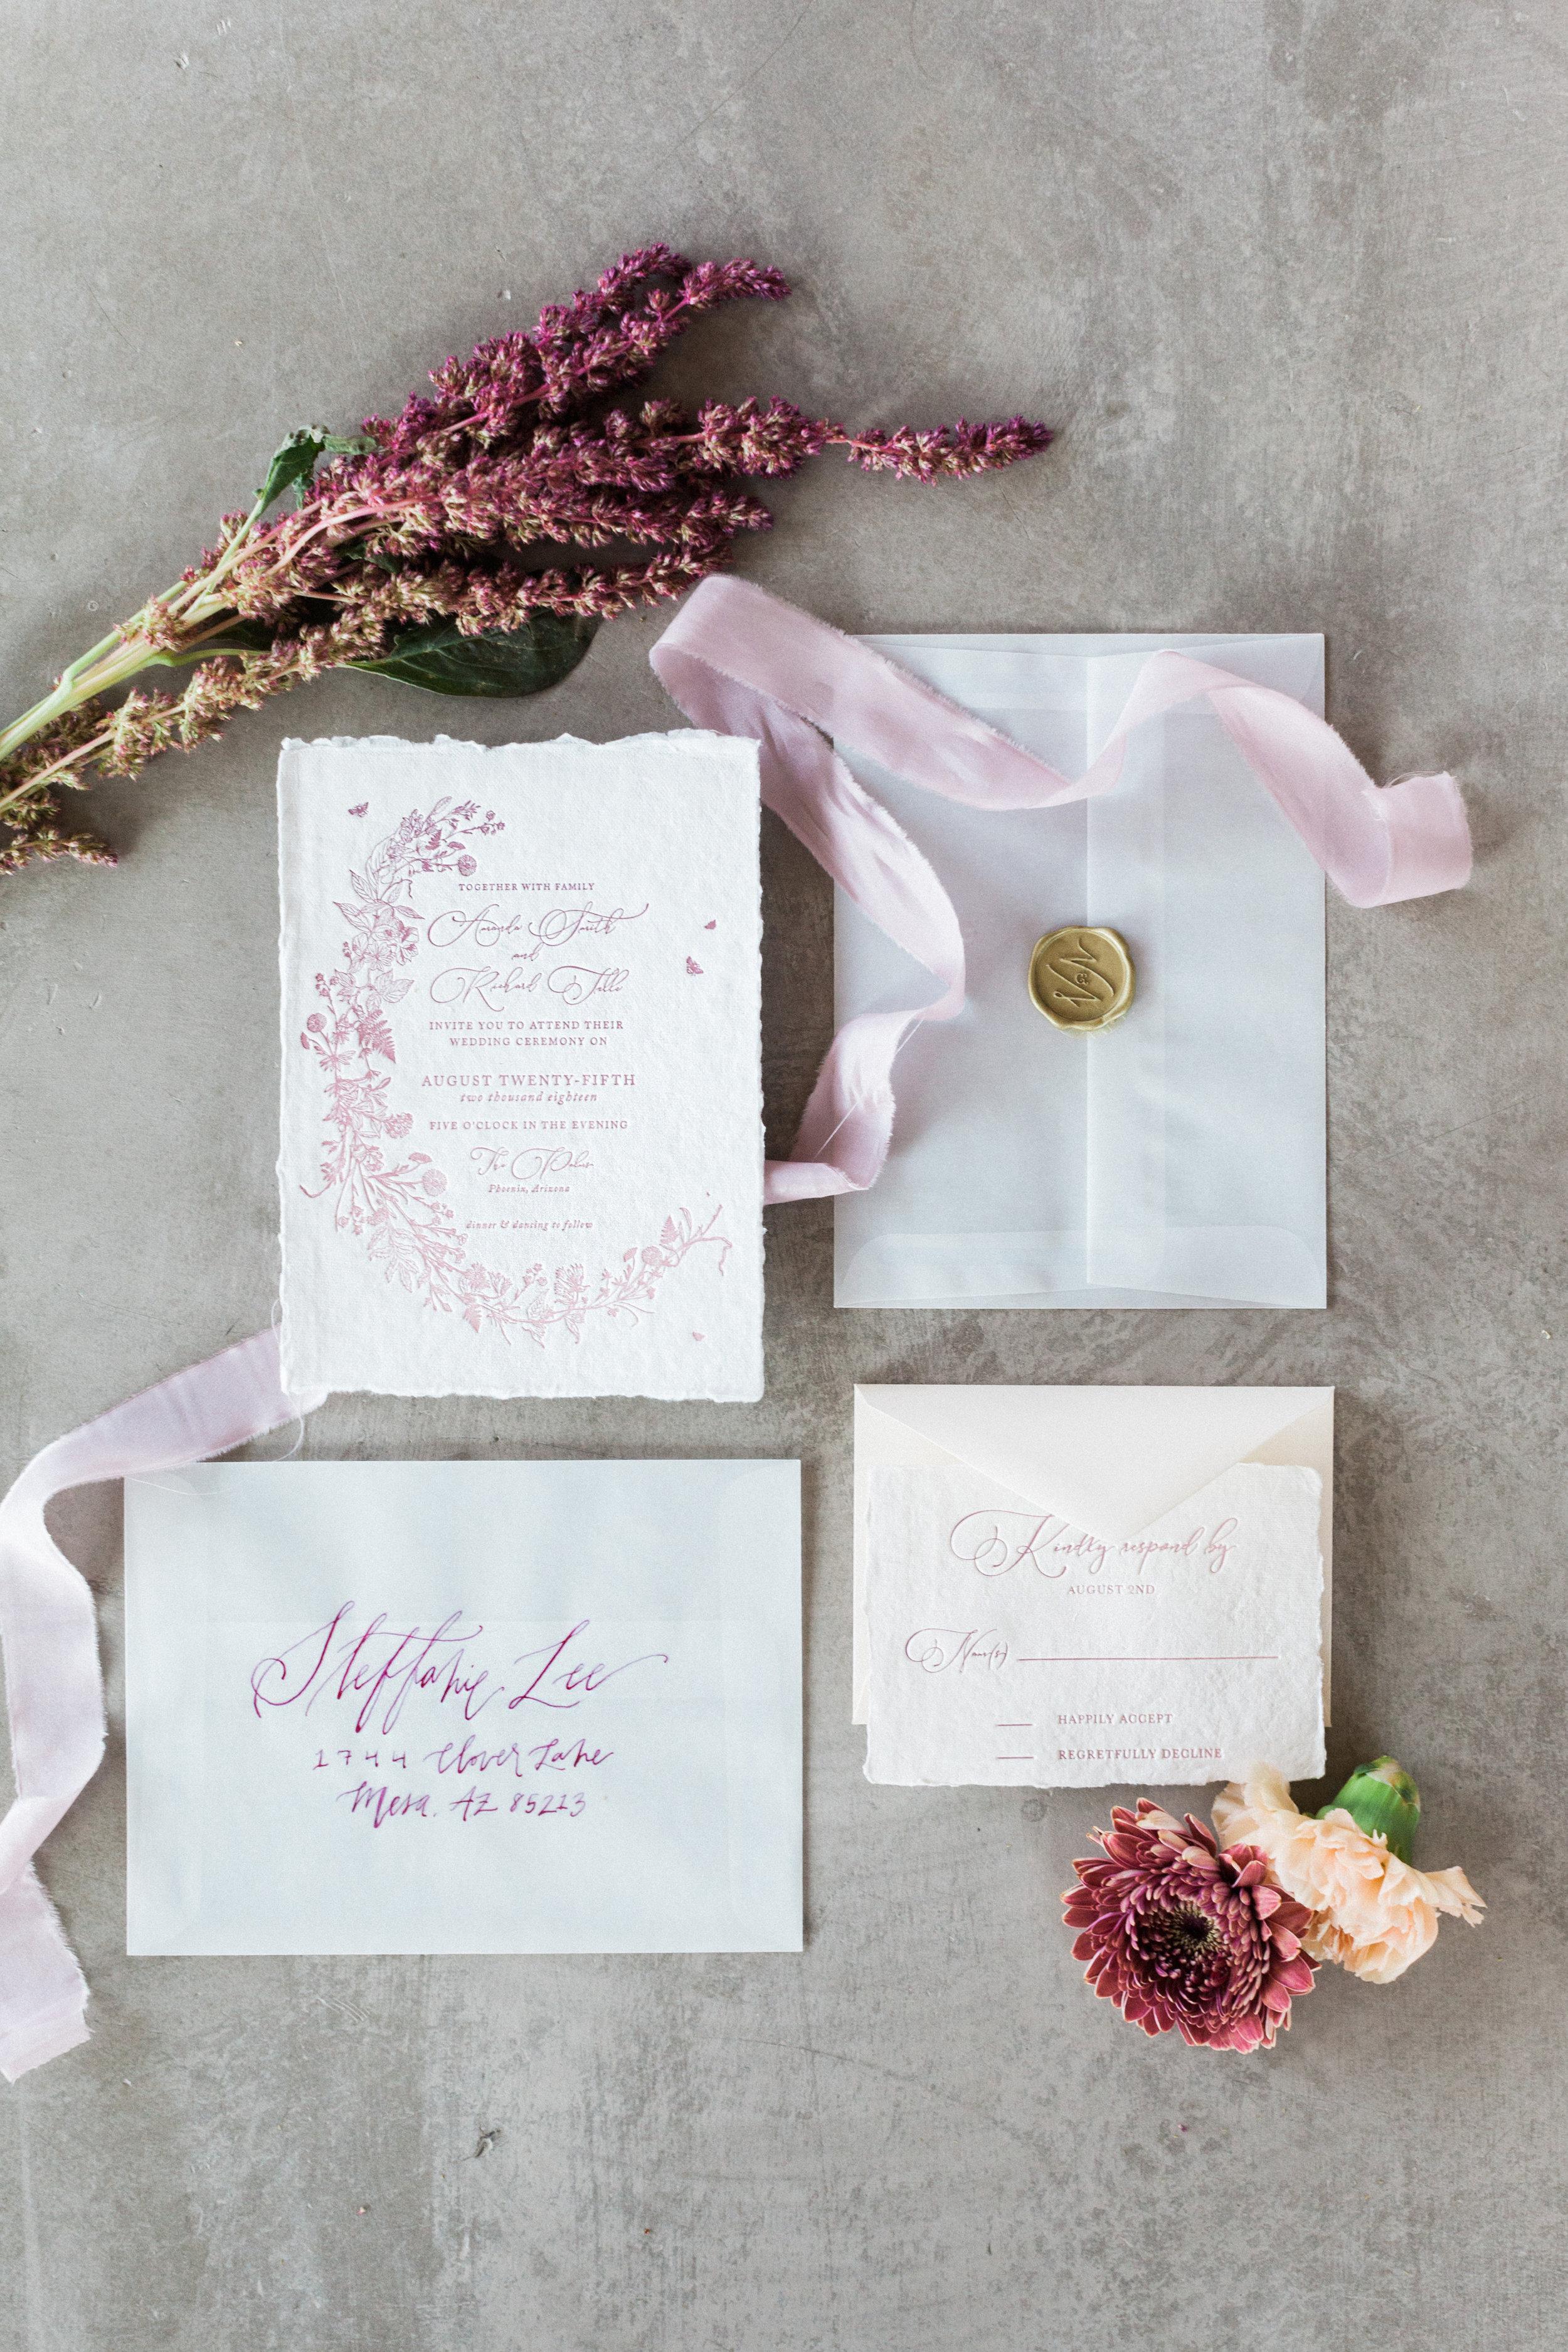 Mauve and Lavender Modern Wedding Inspiration - Invitation